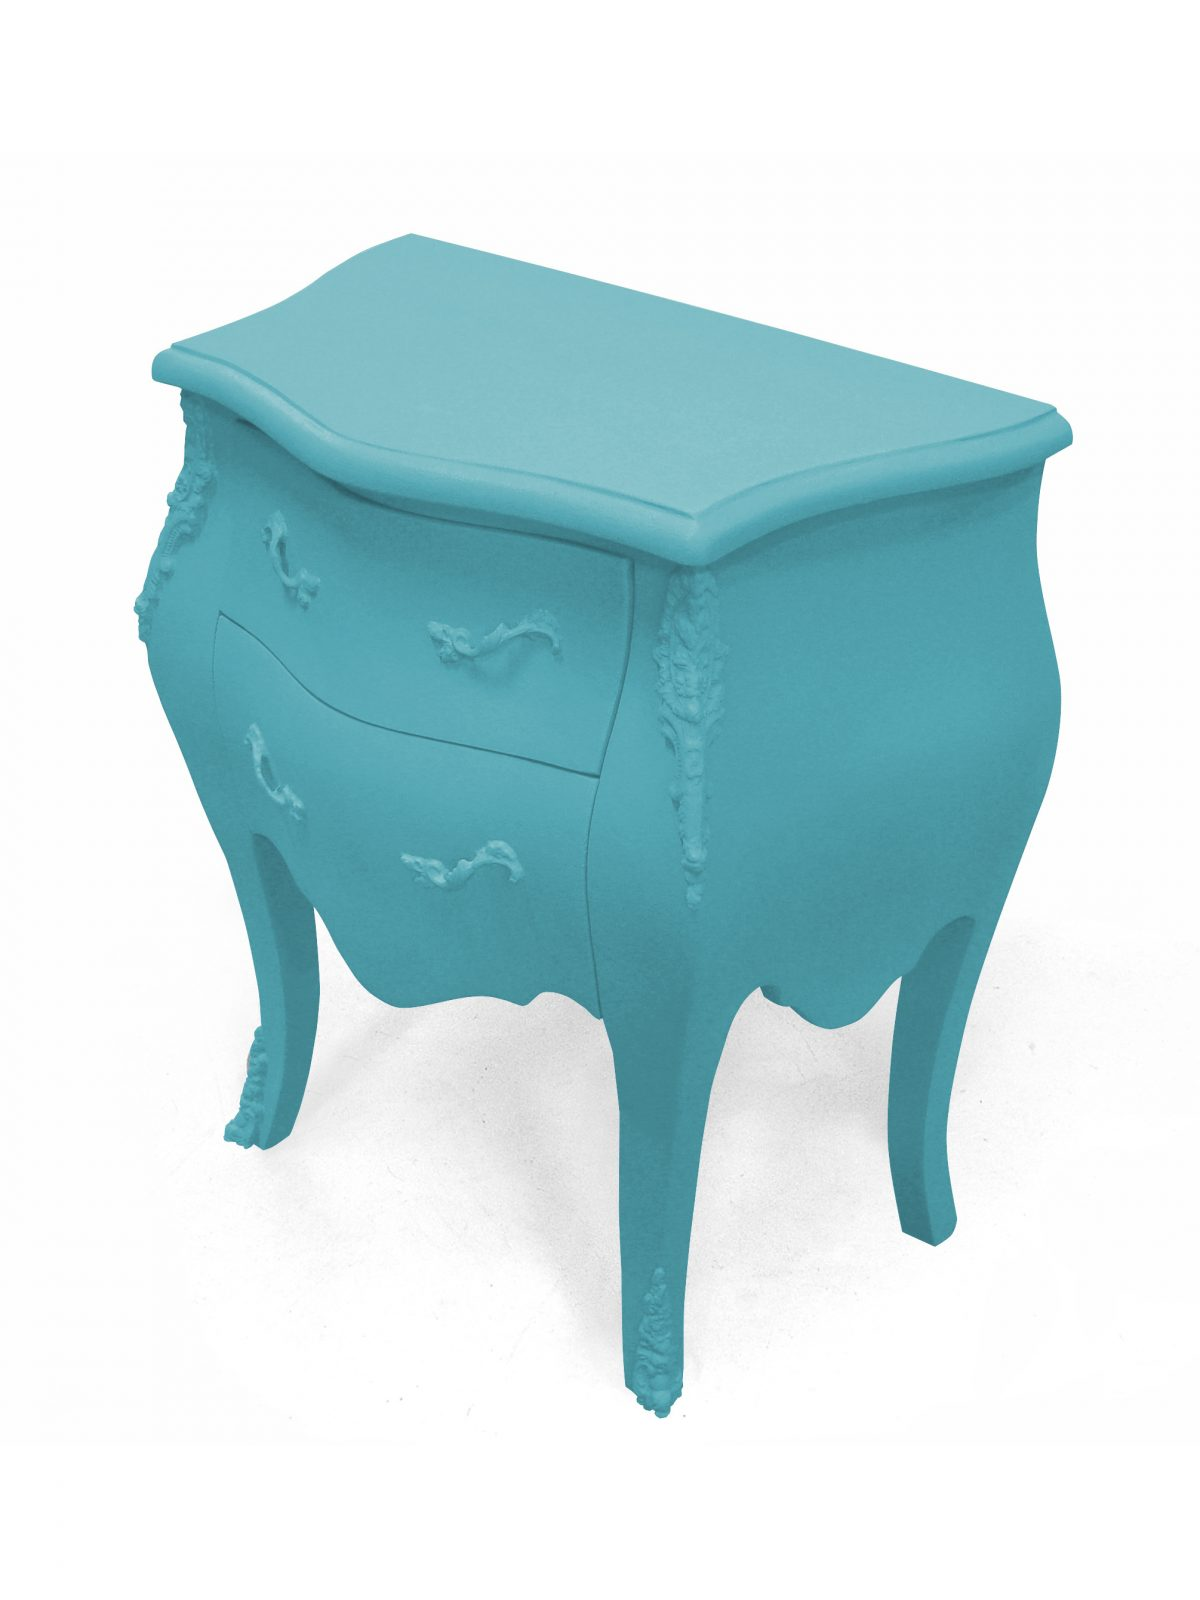 Jspr Plastic Fantastic Exclusief Dressoir Ocean Blue Fun Kastje